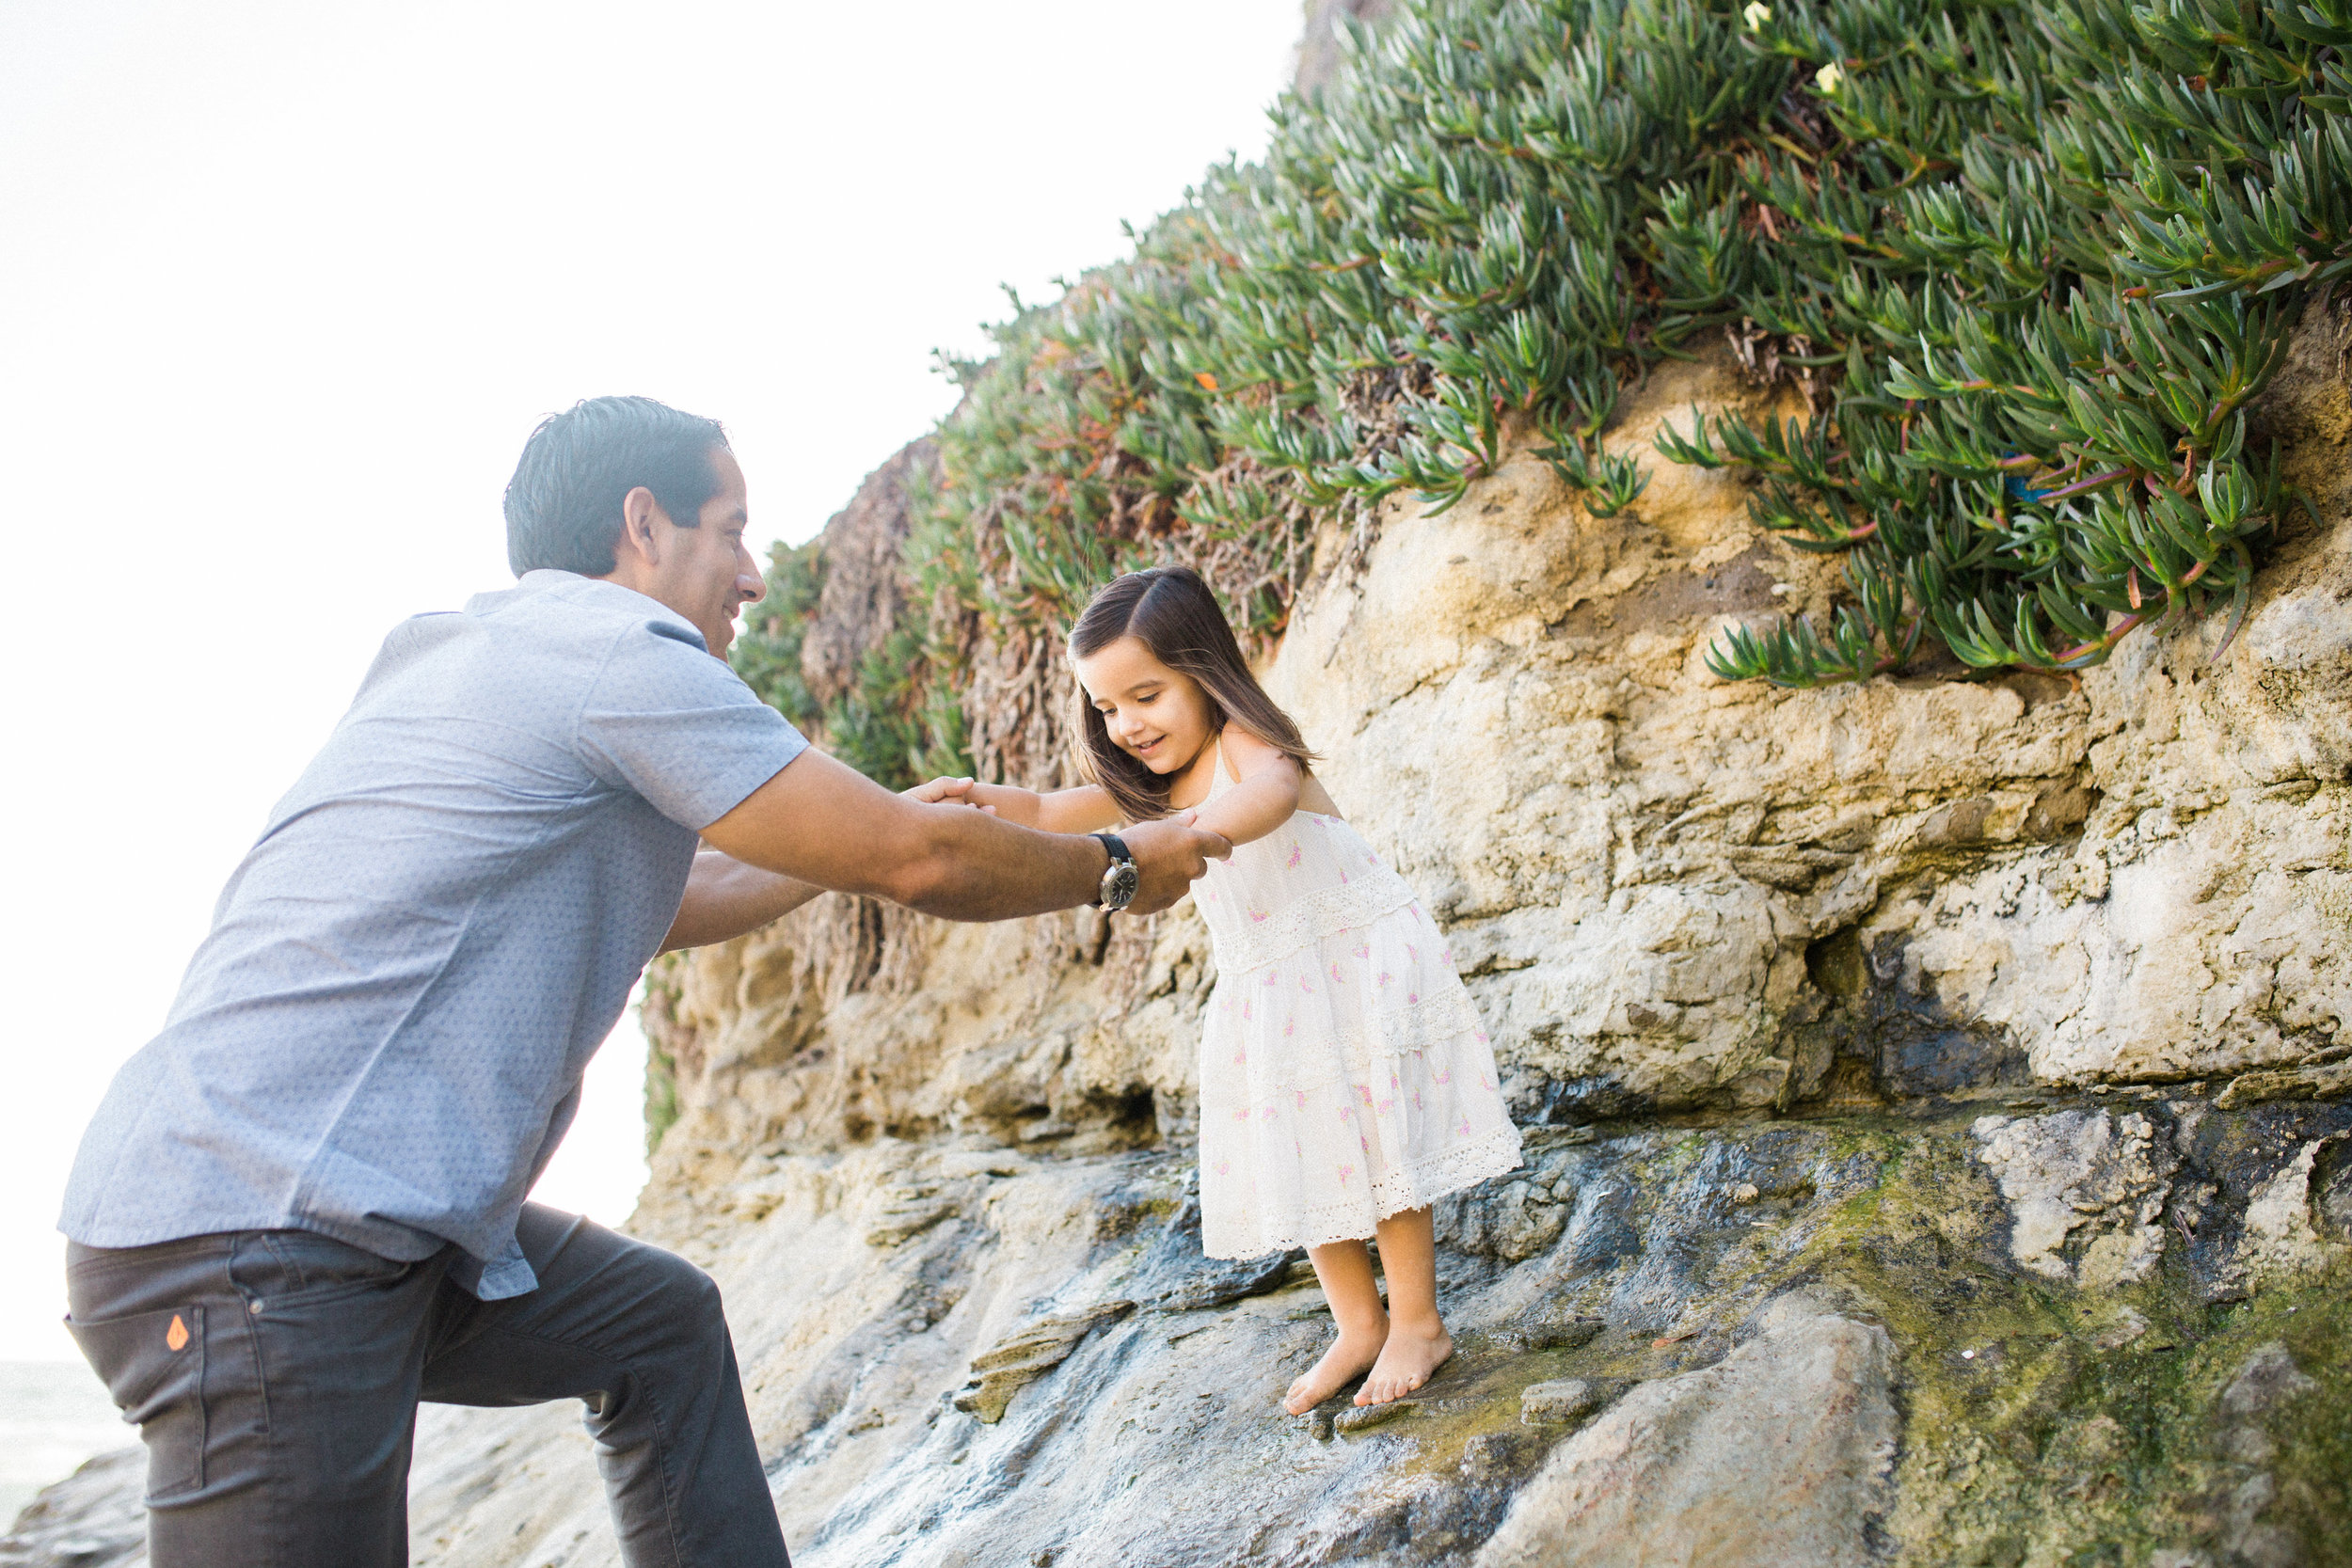 ruiz-family_laguna_los-angeles-beach-family-photography-26.jpg